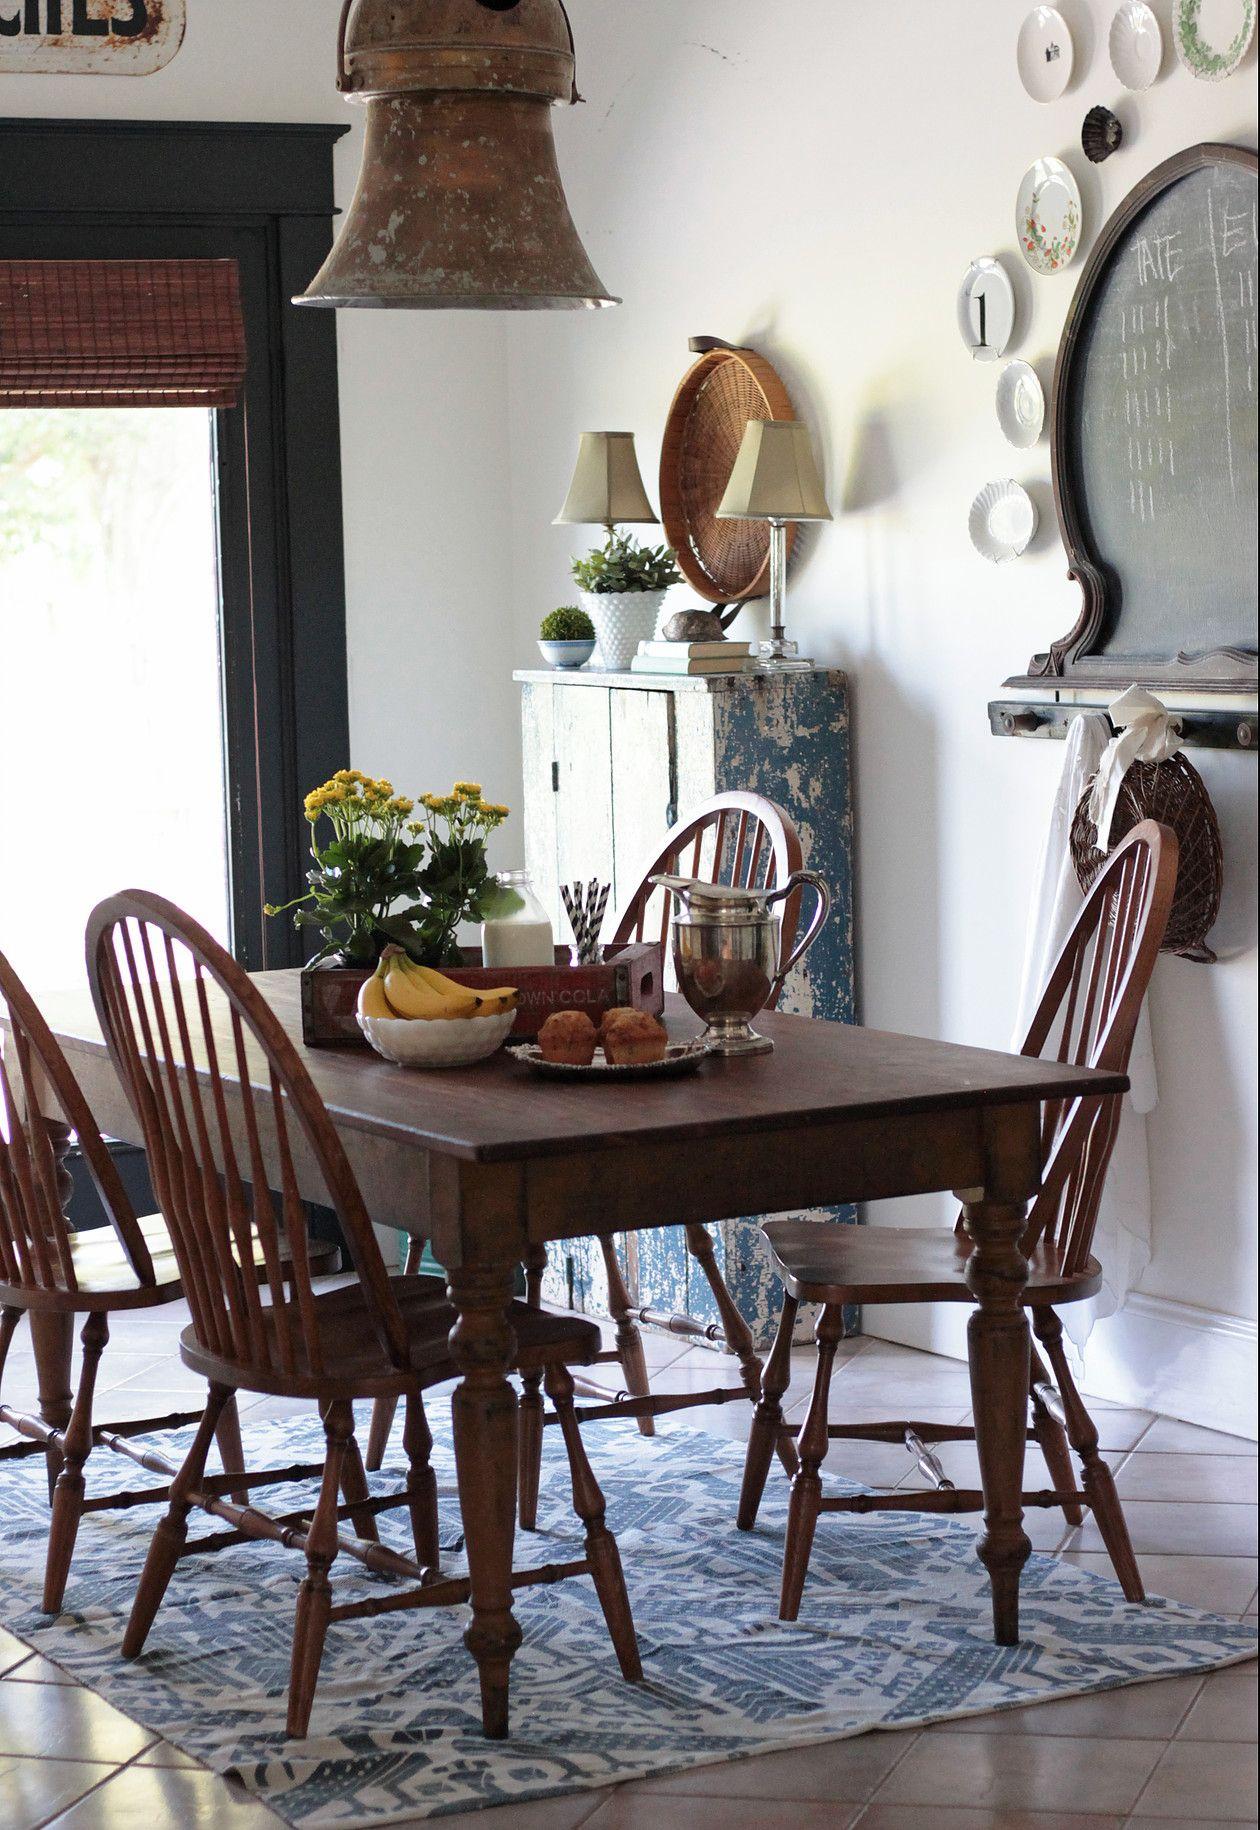 Kitchen Dining Interior Design: Dining Room Design, Small Cabin Interiors, Home